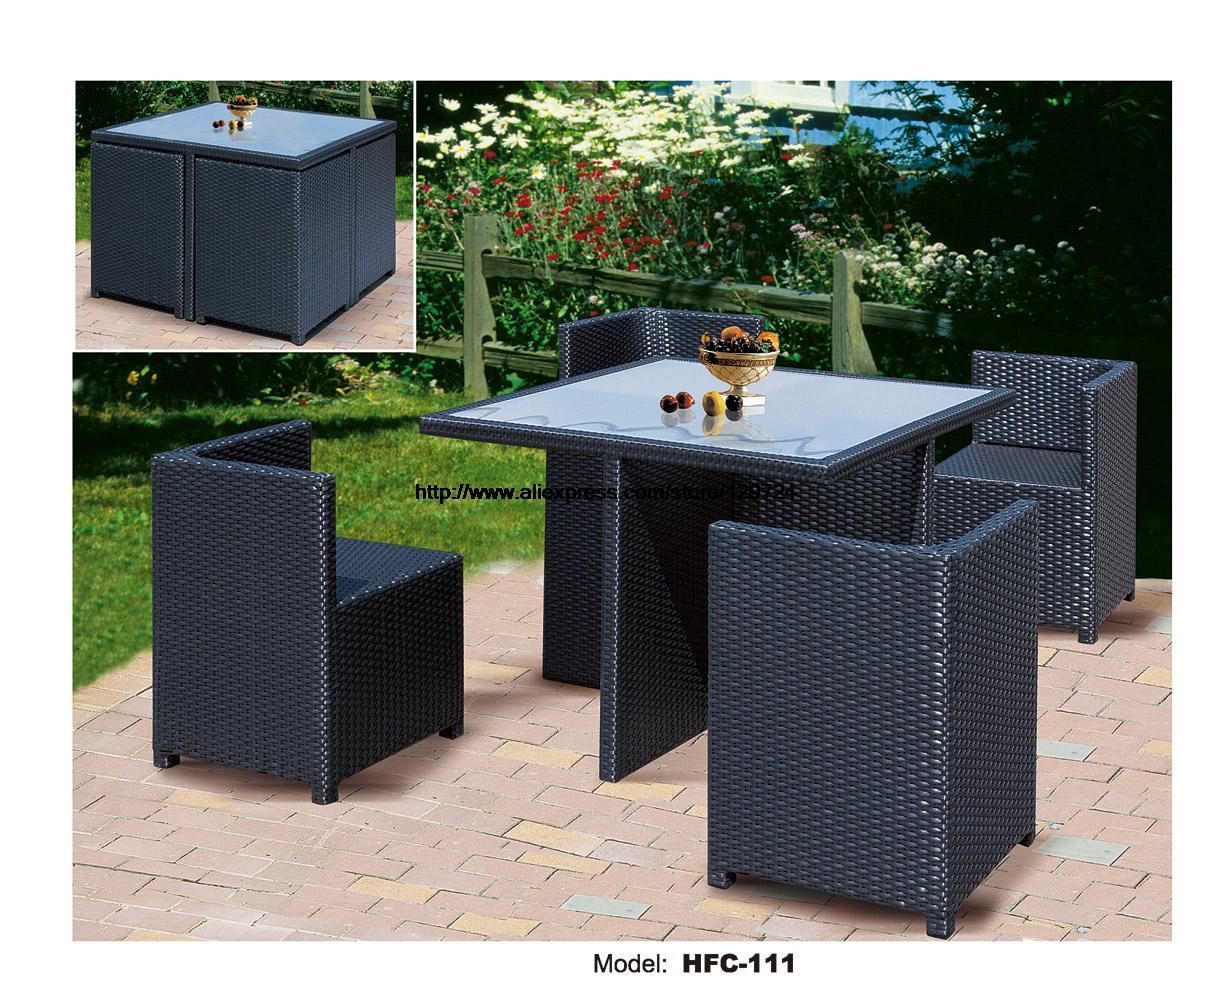 rattan cube garden furniture. Popular Rattan Cube Garden Furniture Buy Cheap Rattan Cube Garden